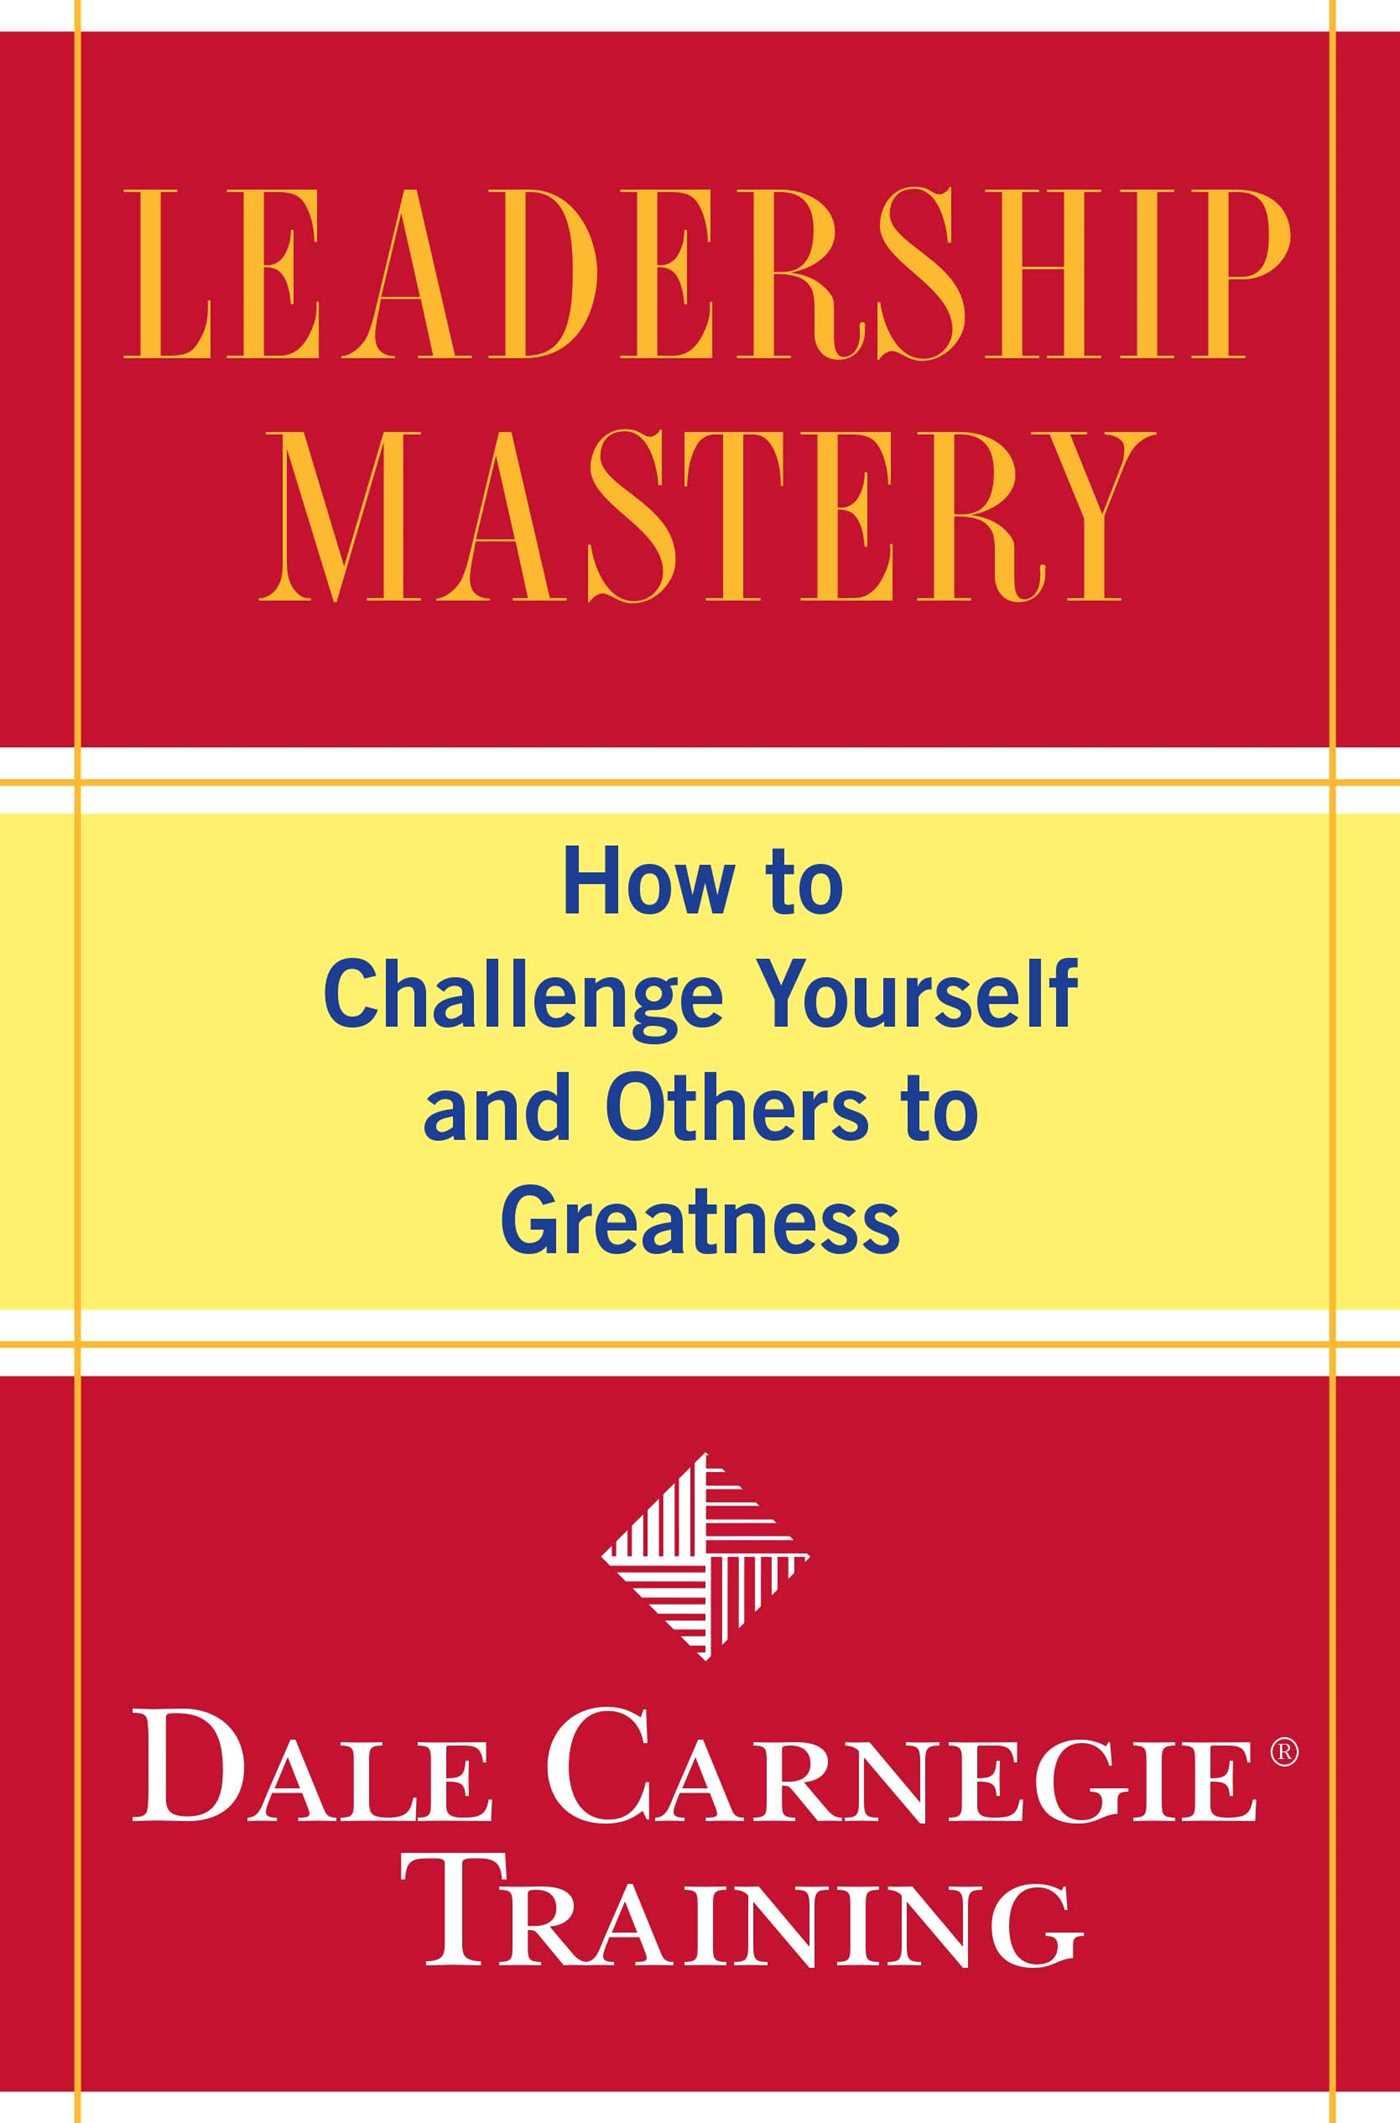 Download Ebook Leadership Mastery by Dale Carnegie Training Pdf